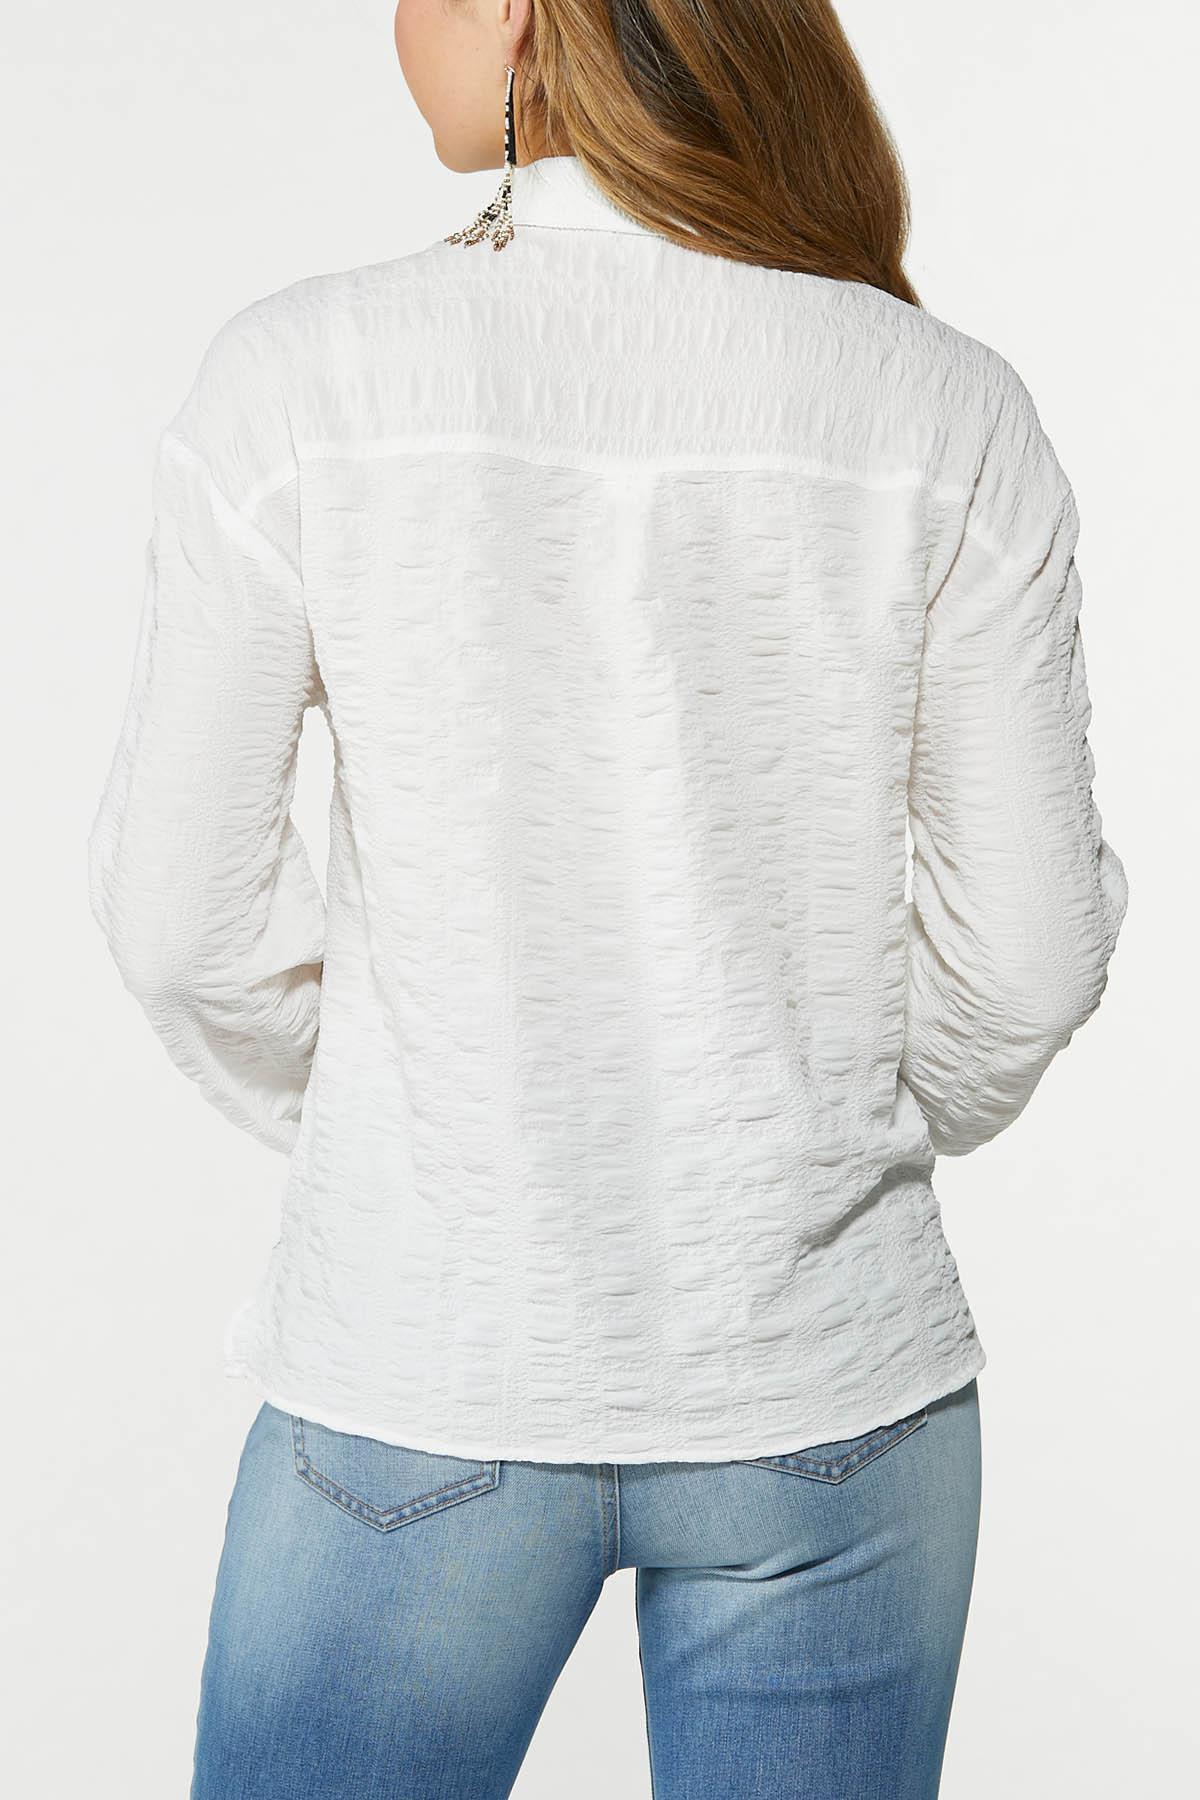 Plus Size Textured Collared Shirt (Item #44749989)